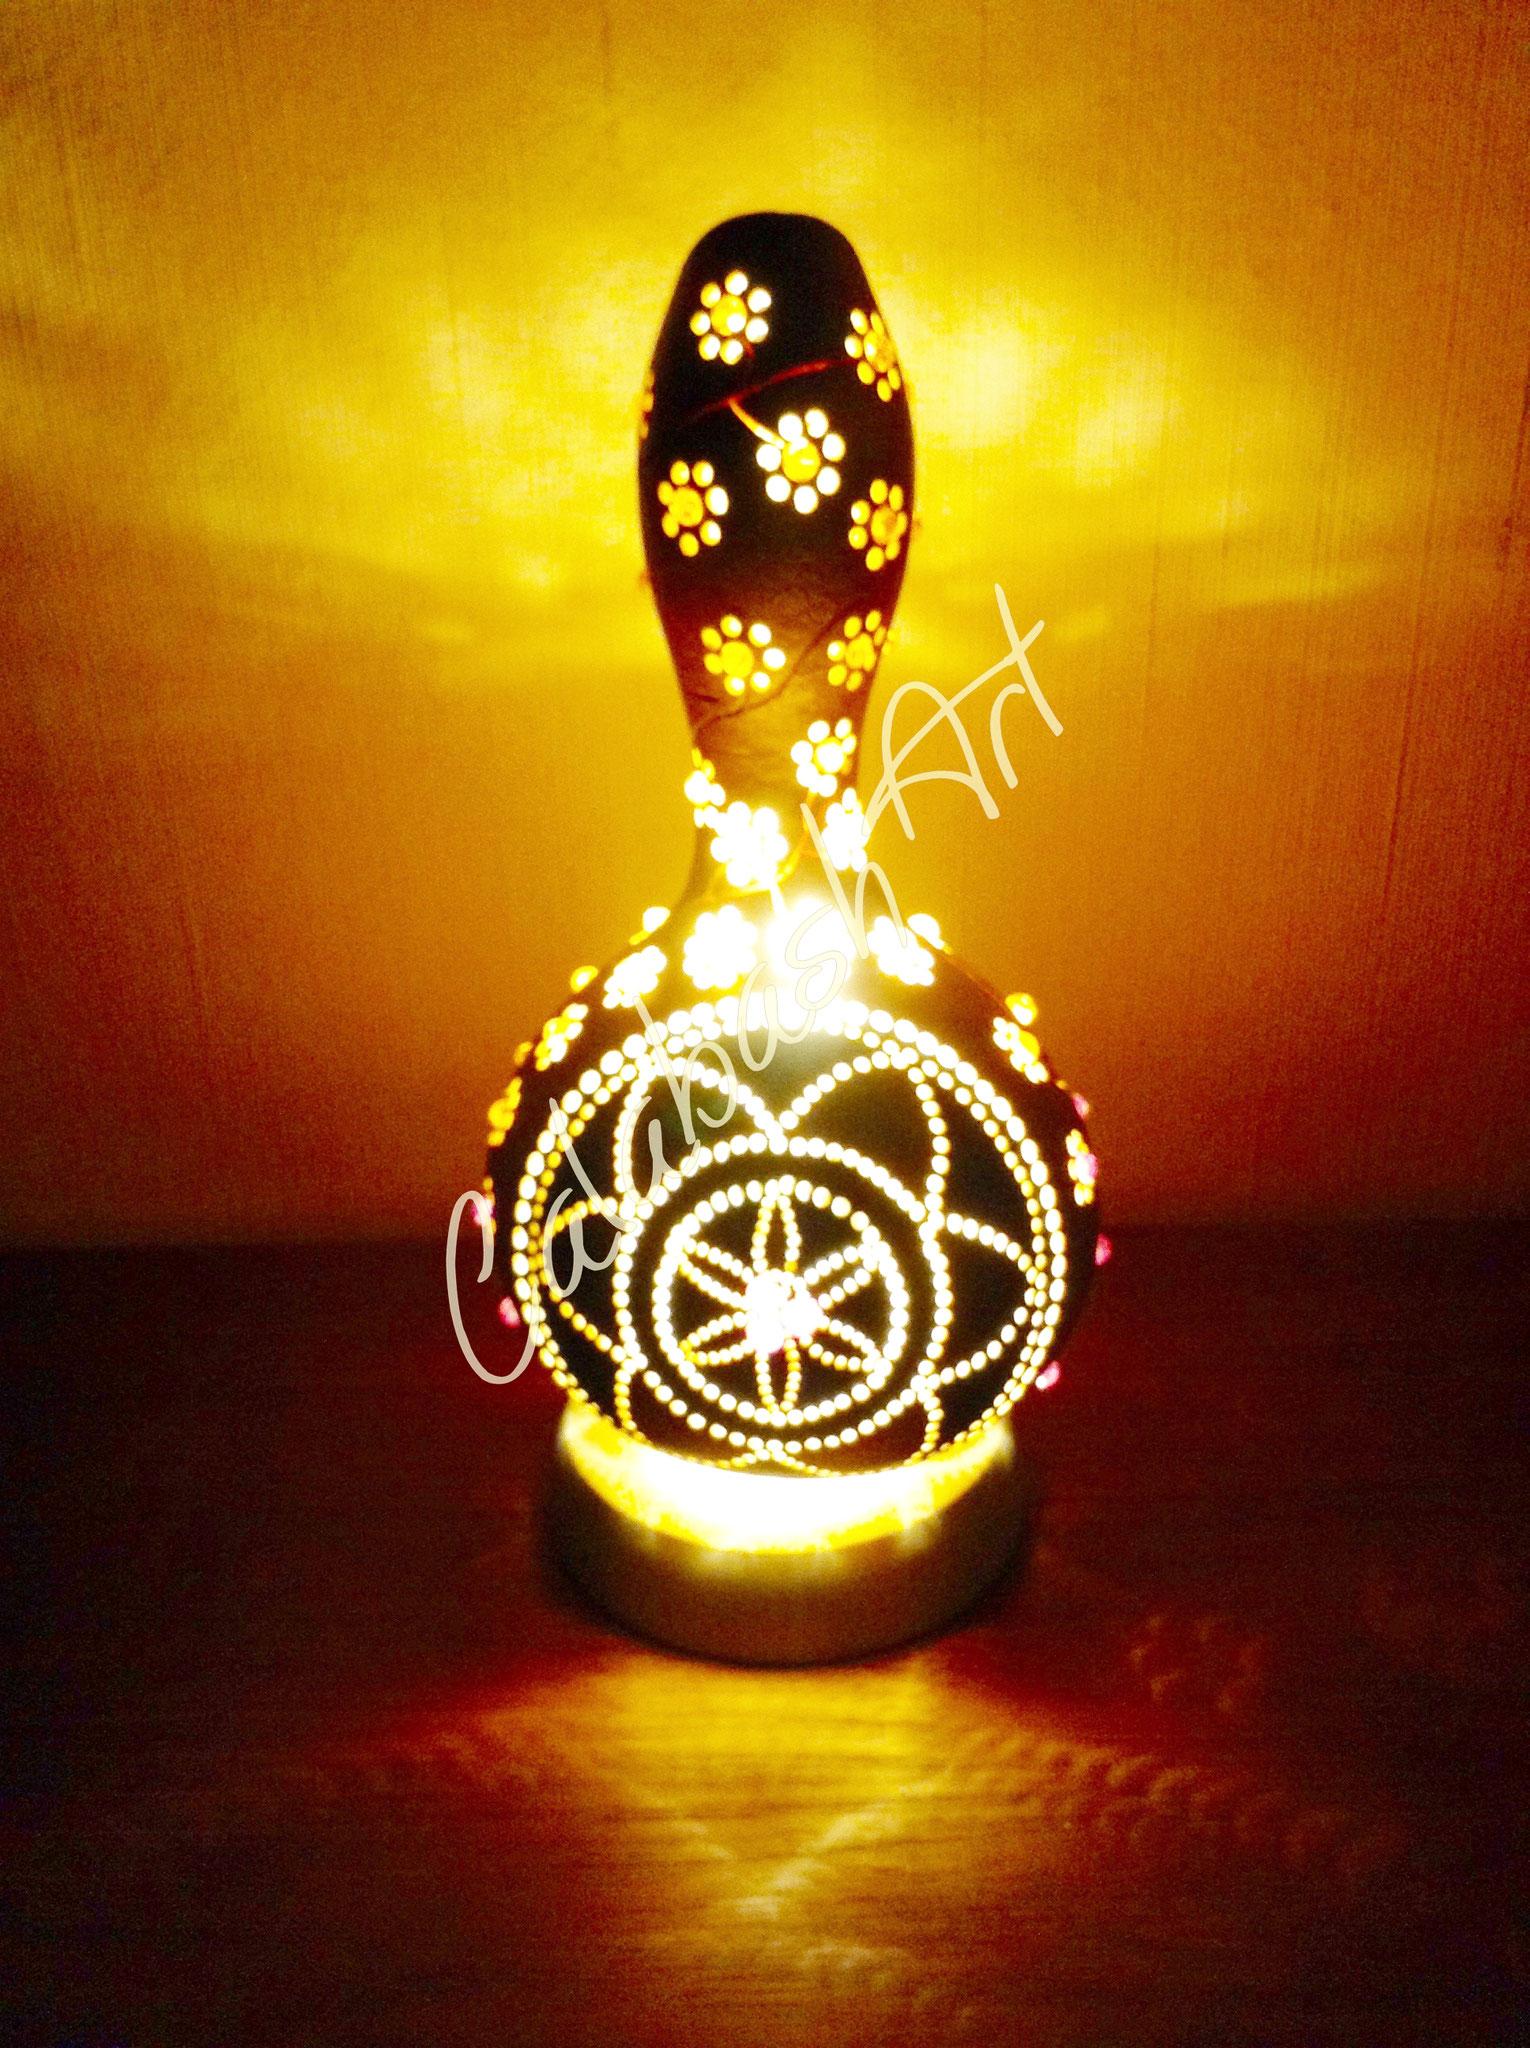 "Tischlampe, Kalebasse ""Blütenranke"" beleuchtet, CalabashArt"